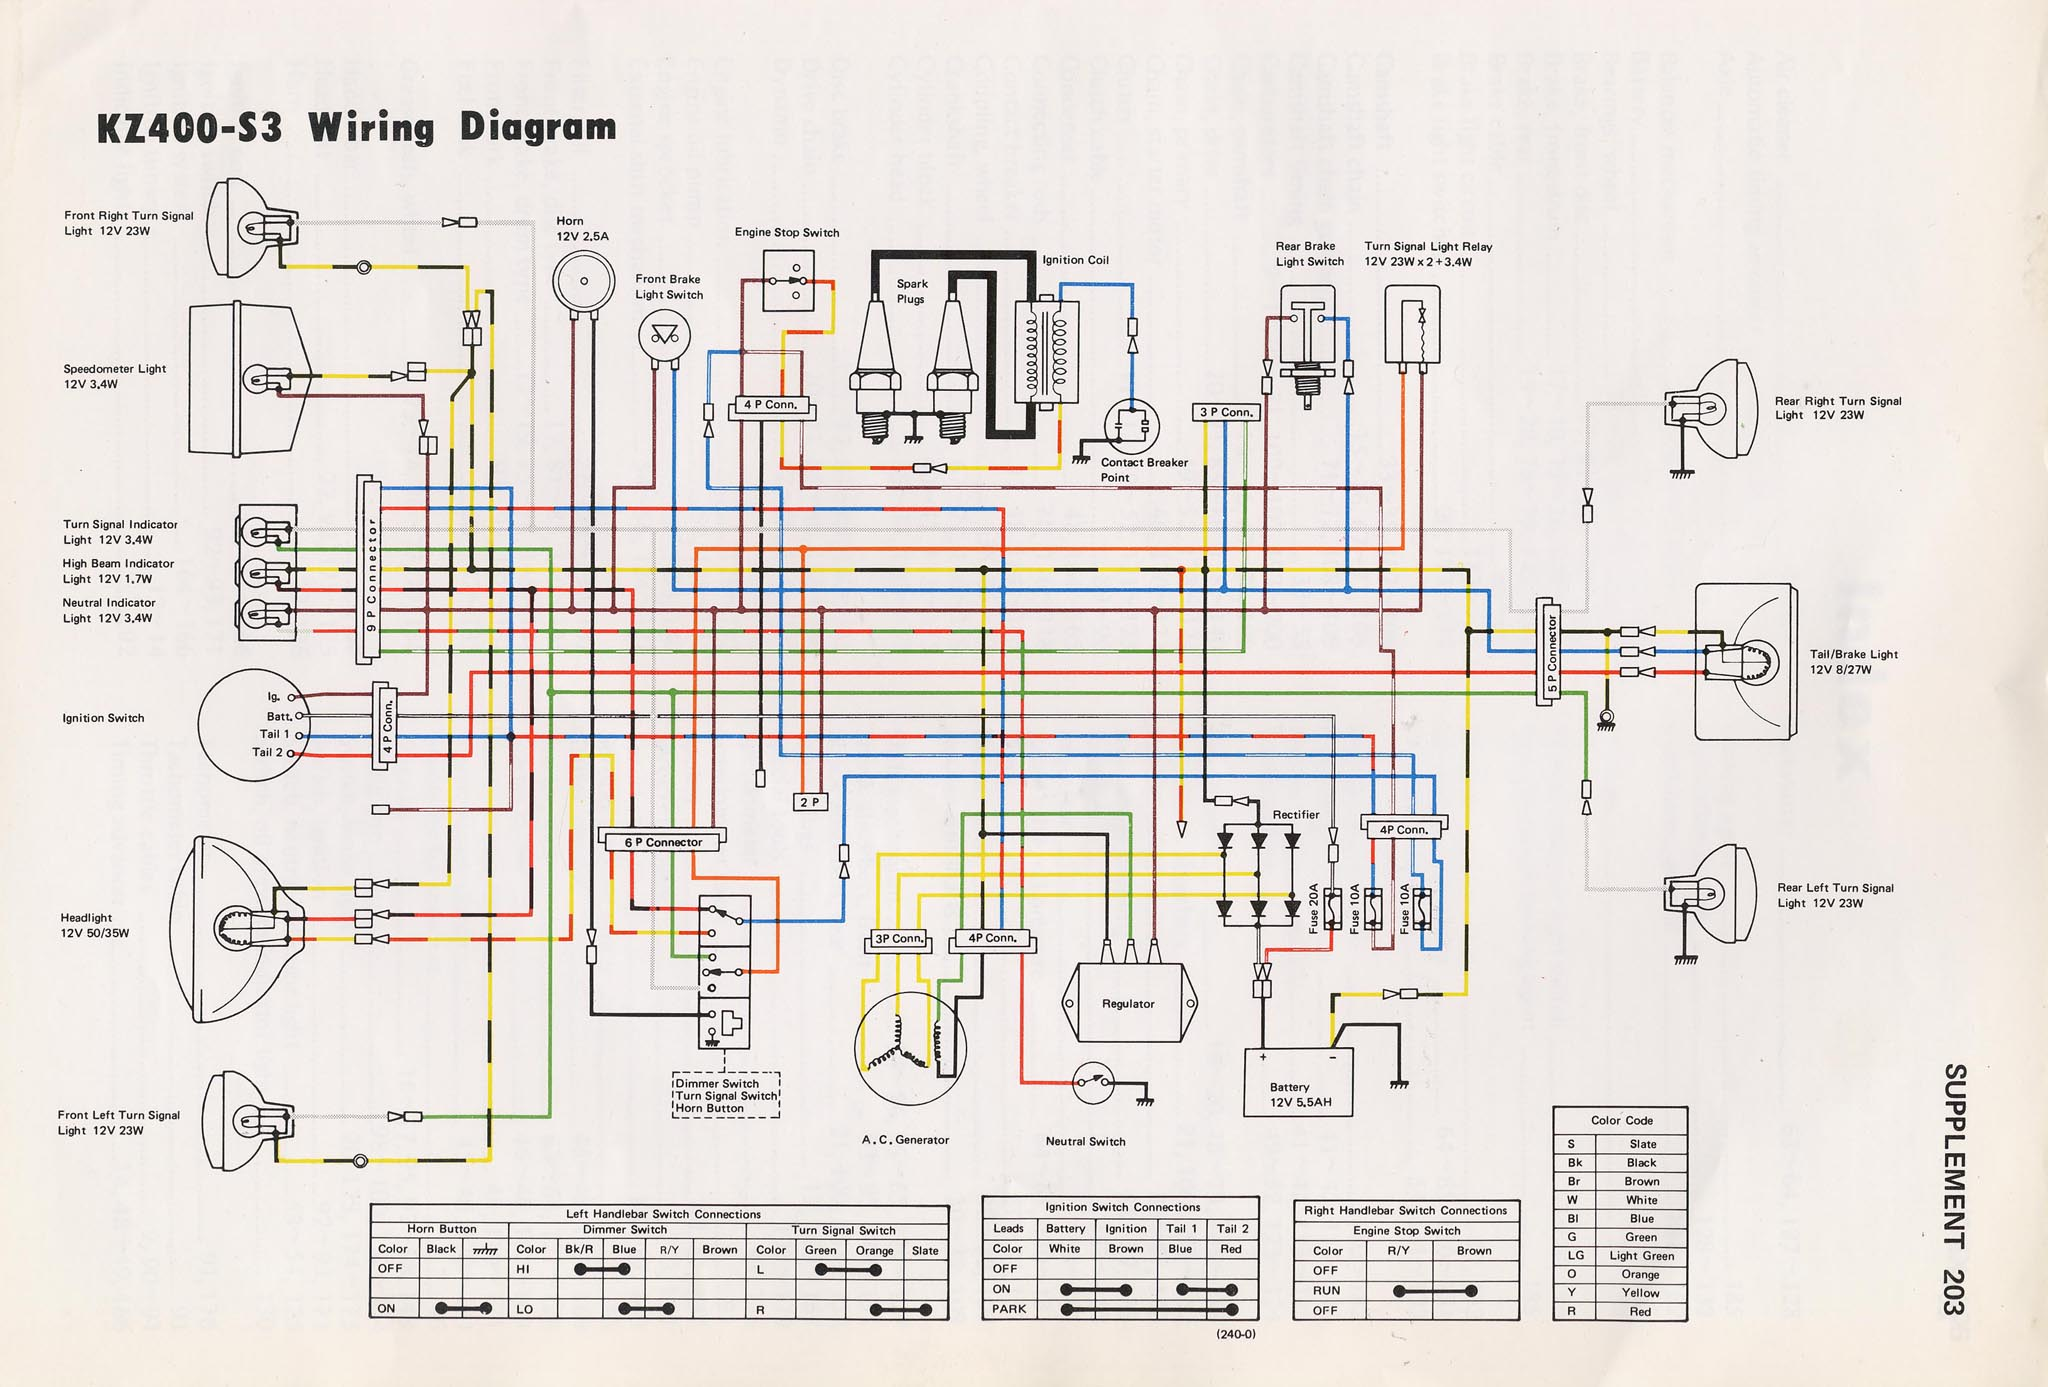 Kawasaki S3 Wiring Diagram Complete Diagrams 1500 K Z 440 Wire Schematics U2022 Rh Seniorlivinguniversity Co 1978 Inviter